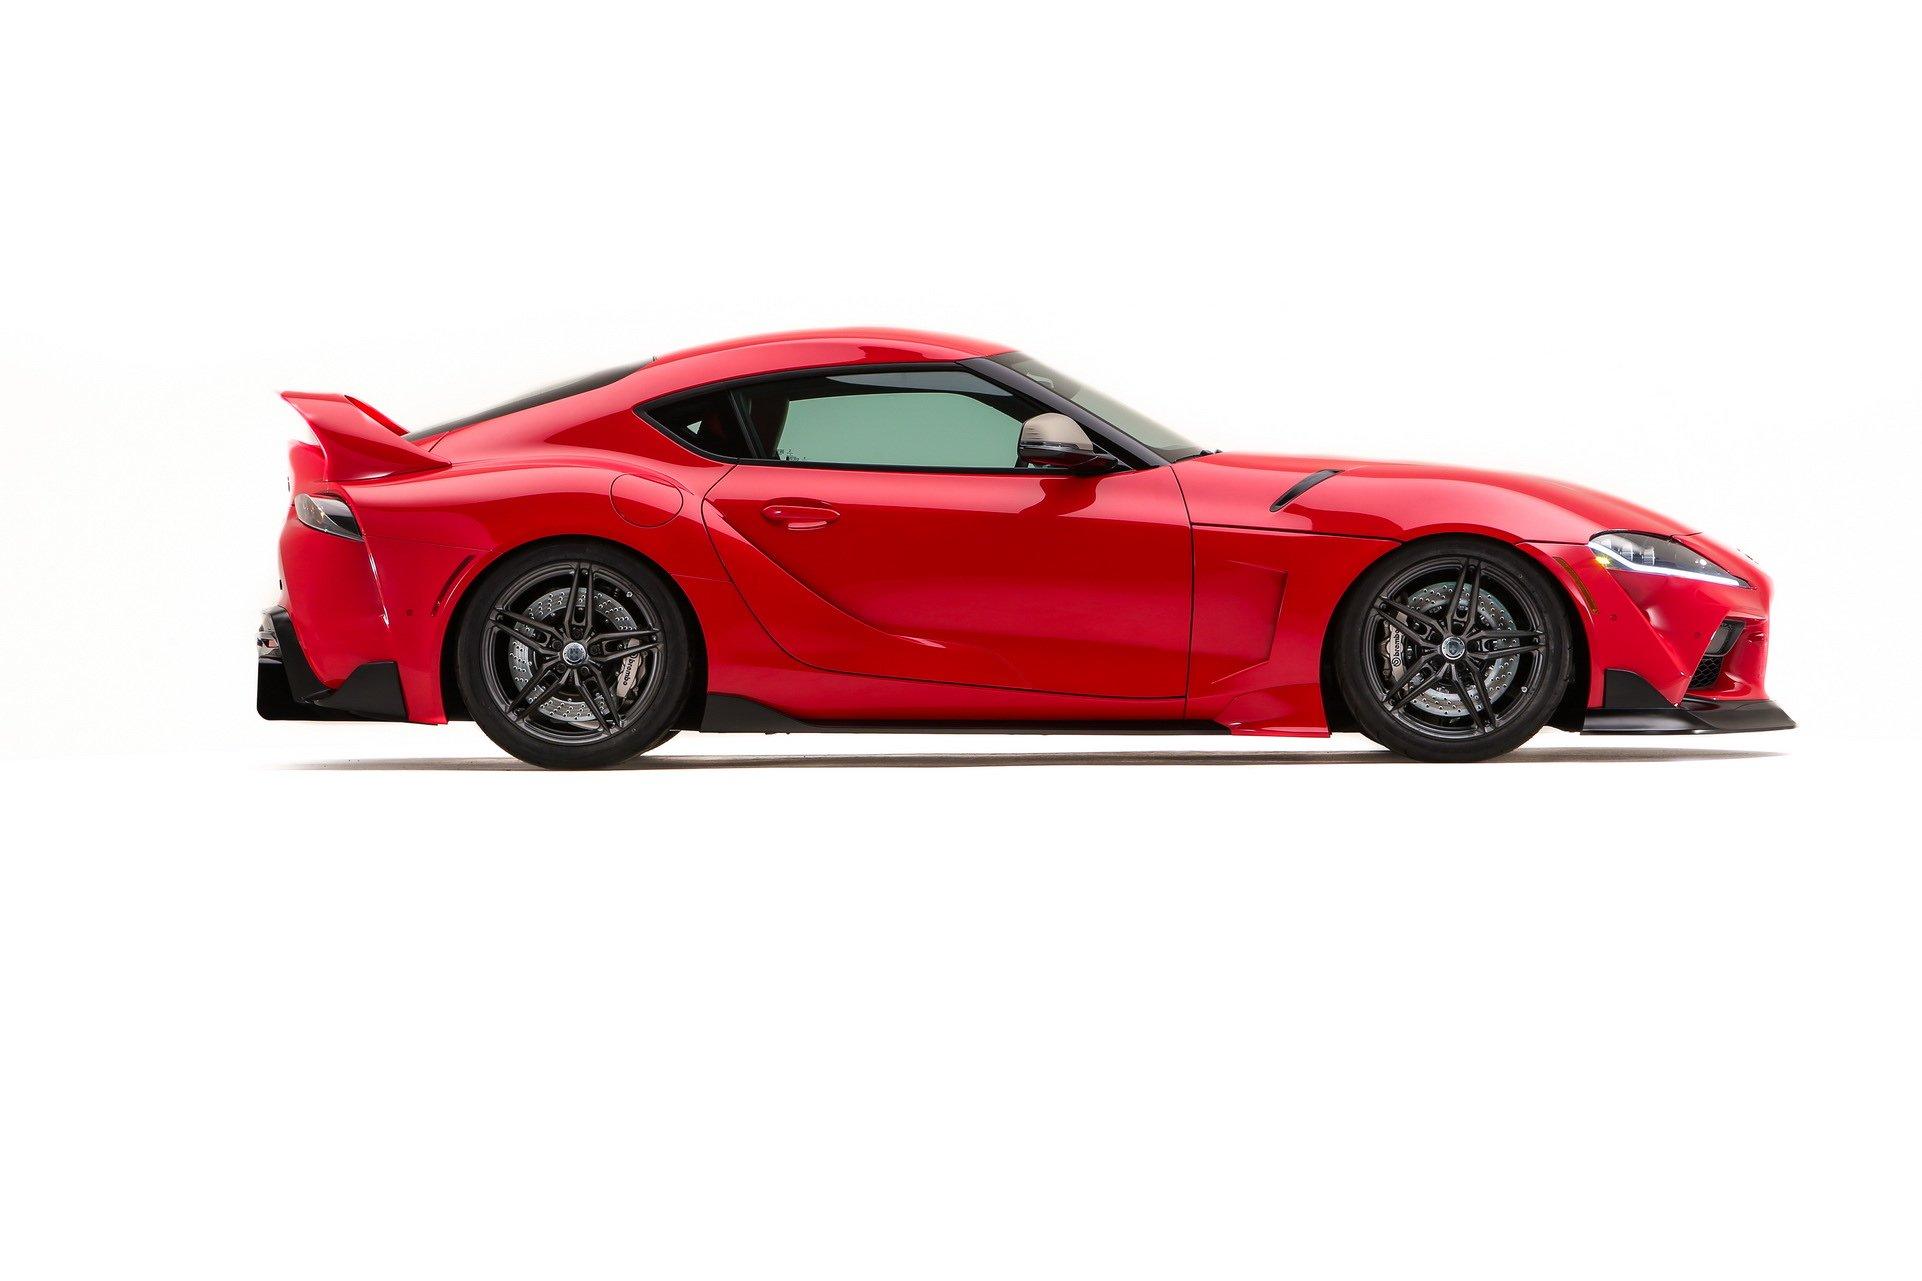 2020-Toyota-GR-Supra-Heritage-Edition-15